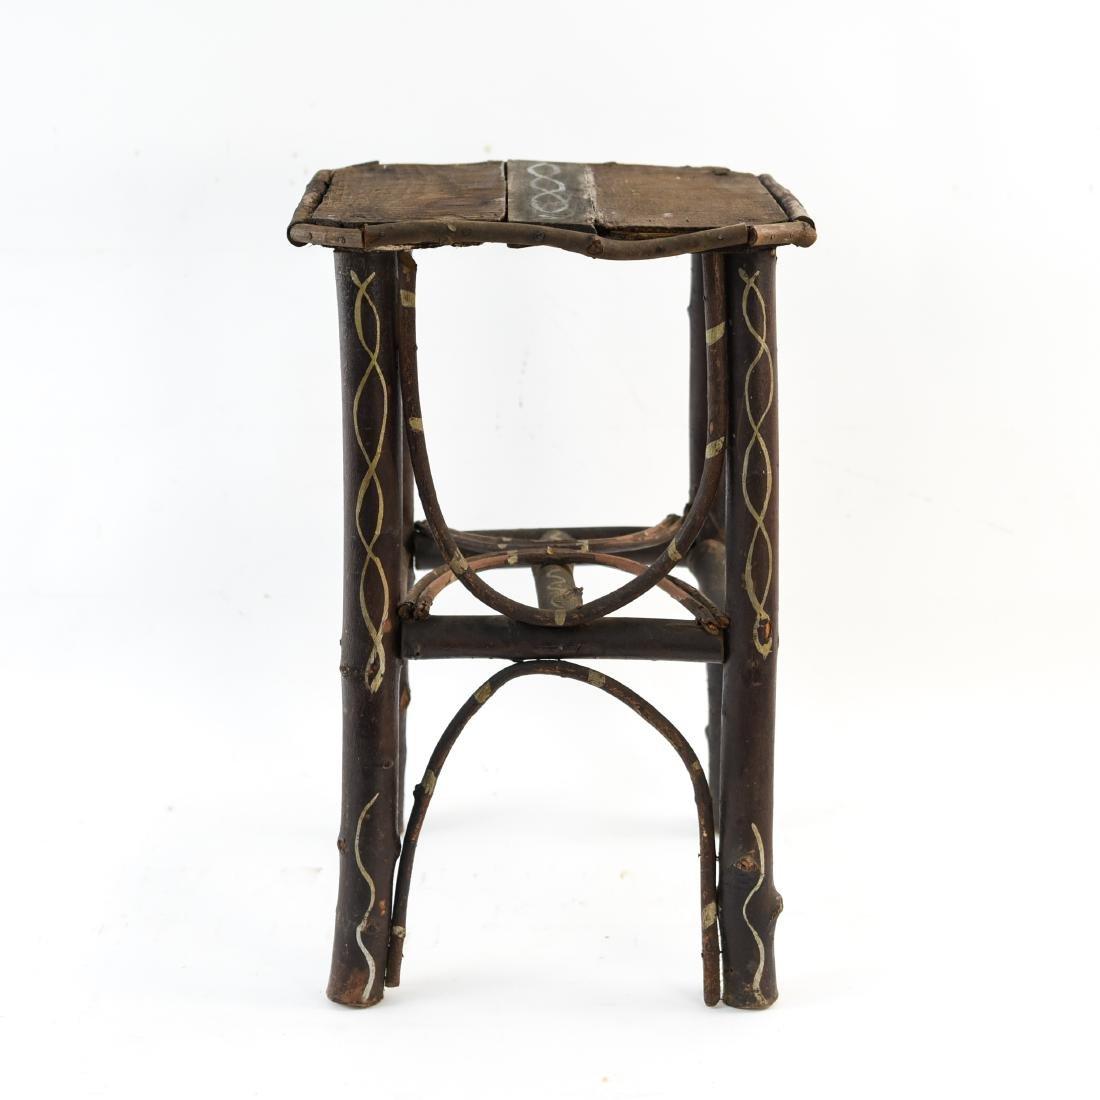 ADIRONDACK STYLE SIDE TABLE